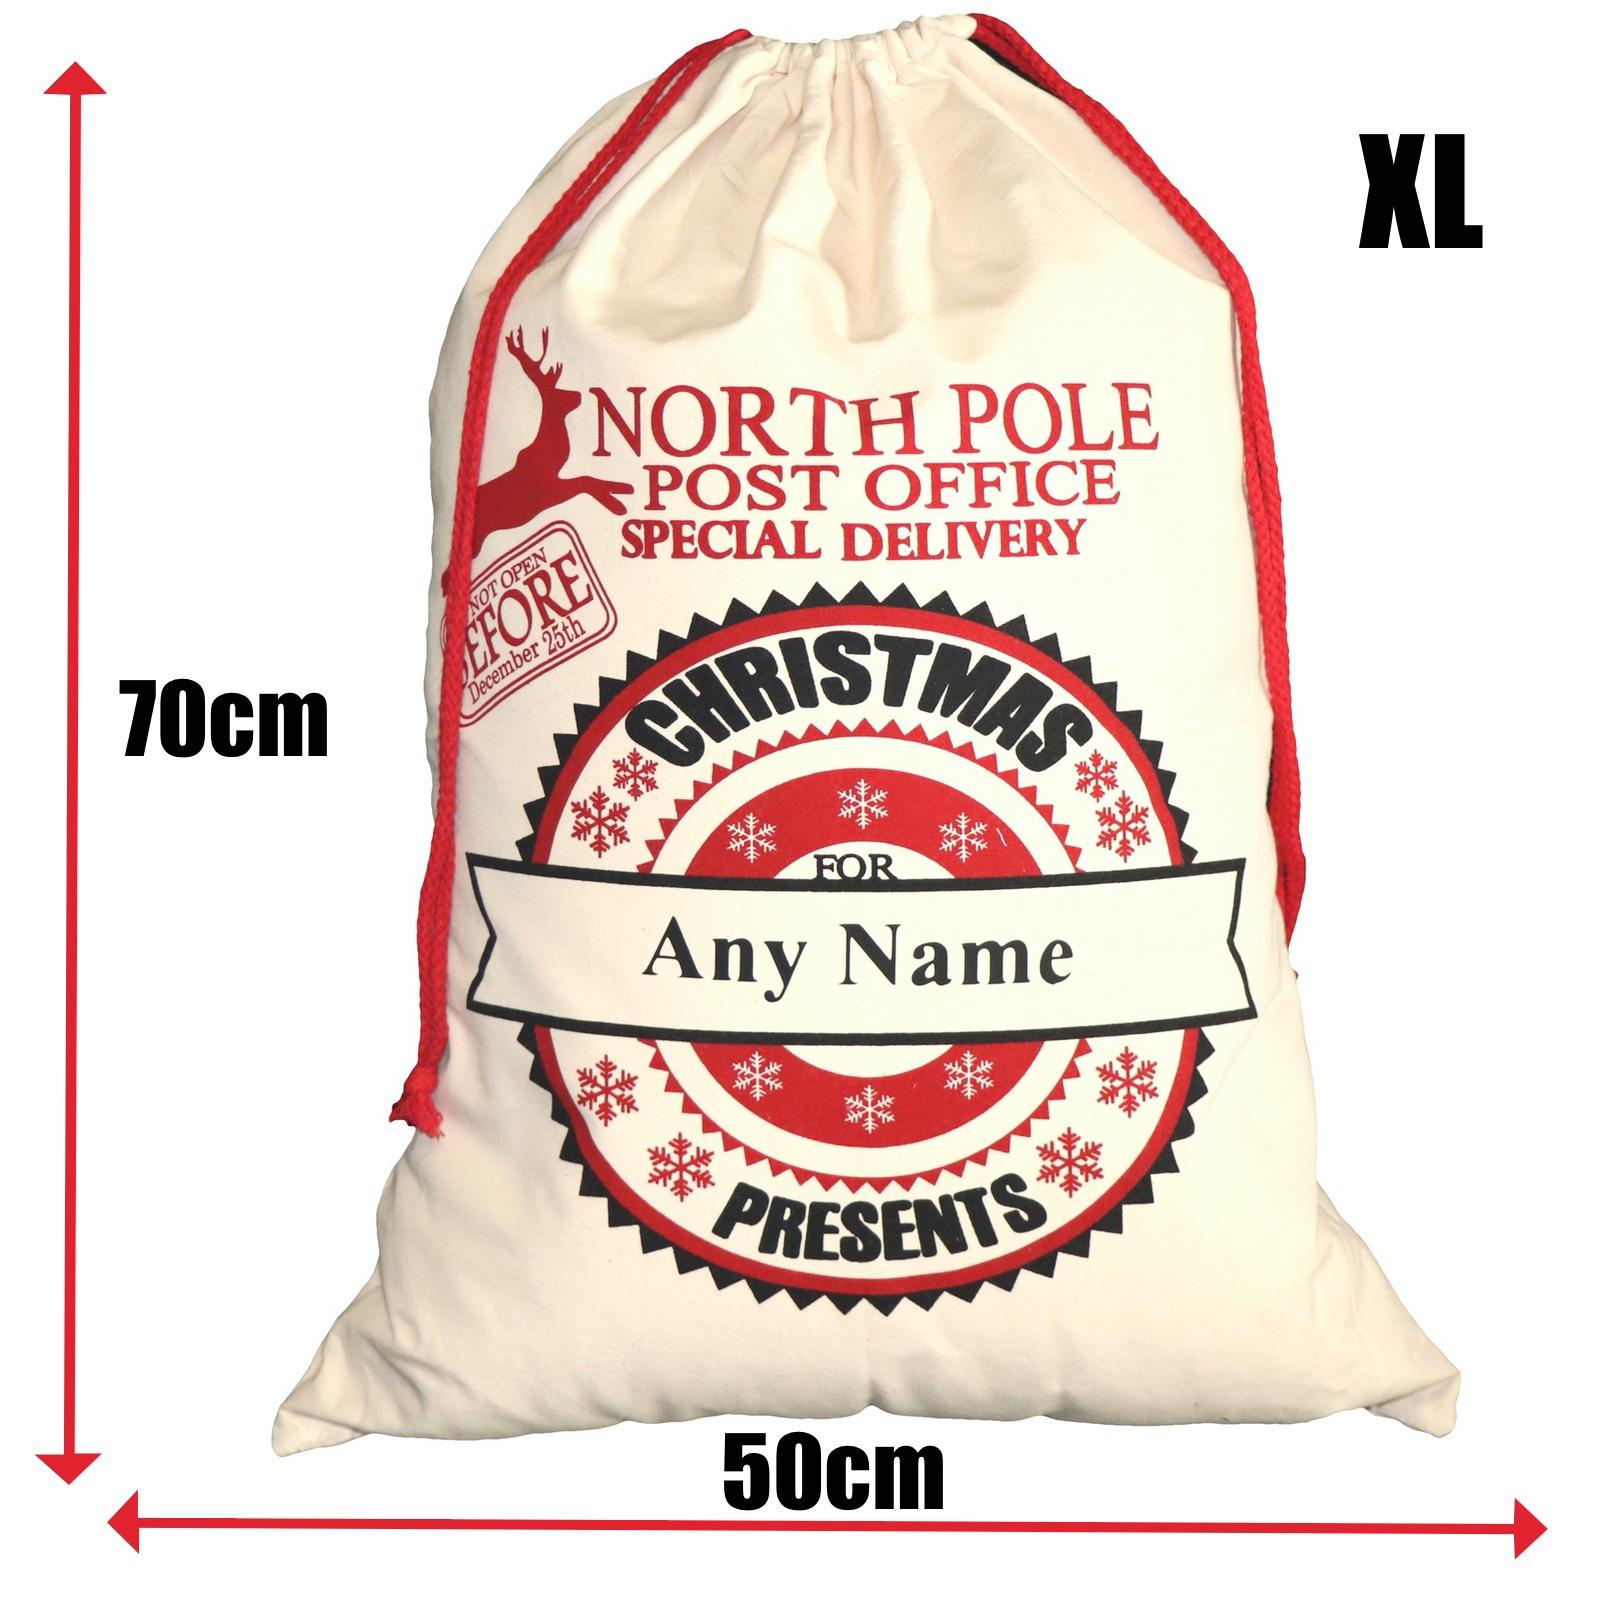 BR-Crafts North Pole Express Sacks